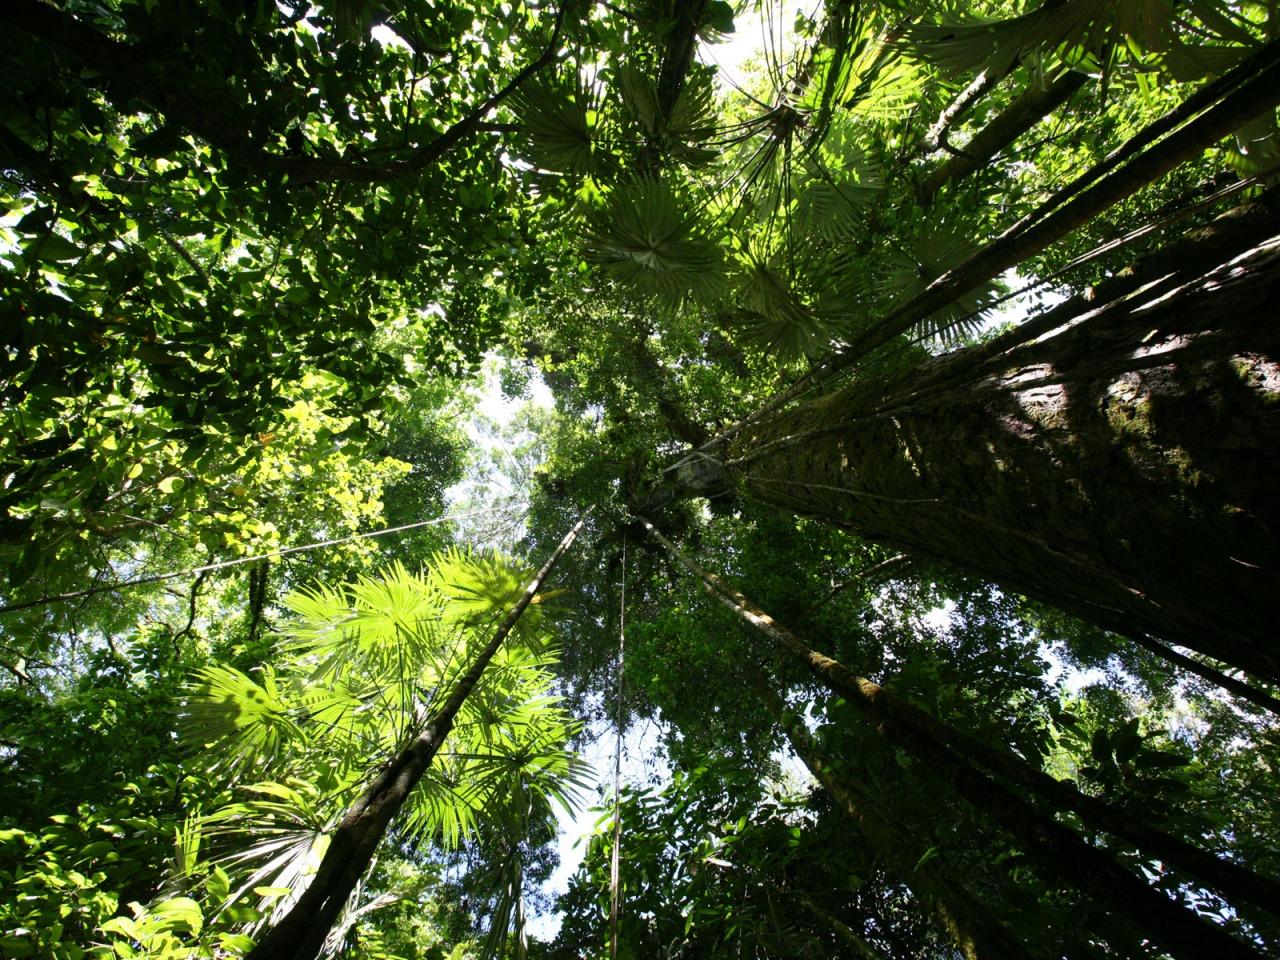 http://4.bp.blogspot.com/-qoGvQEaTL7E/TtxItirfjsI/AAAAAAAAAm8/OfaoOiIVQbo/s1600/rainforest-hd-9-782678.jpg